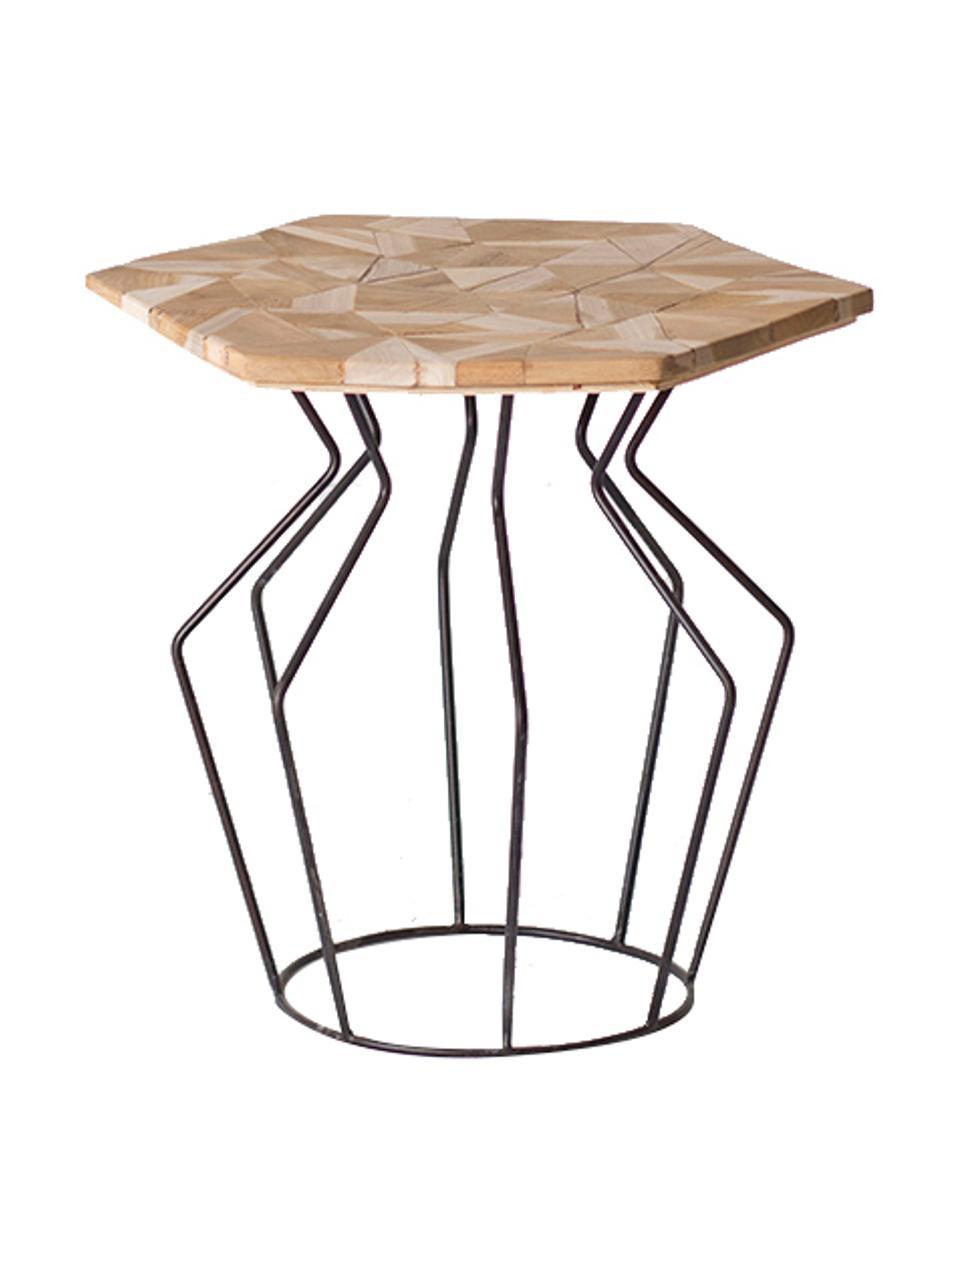 Tavolino beige/nero Baron, Gambe: metallo, Beige, nero, Larg. 45 x Alt. 45 cm